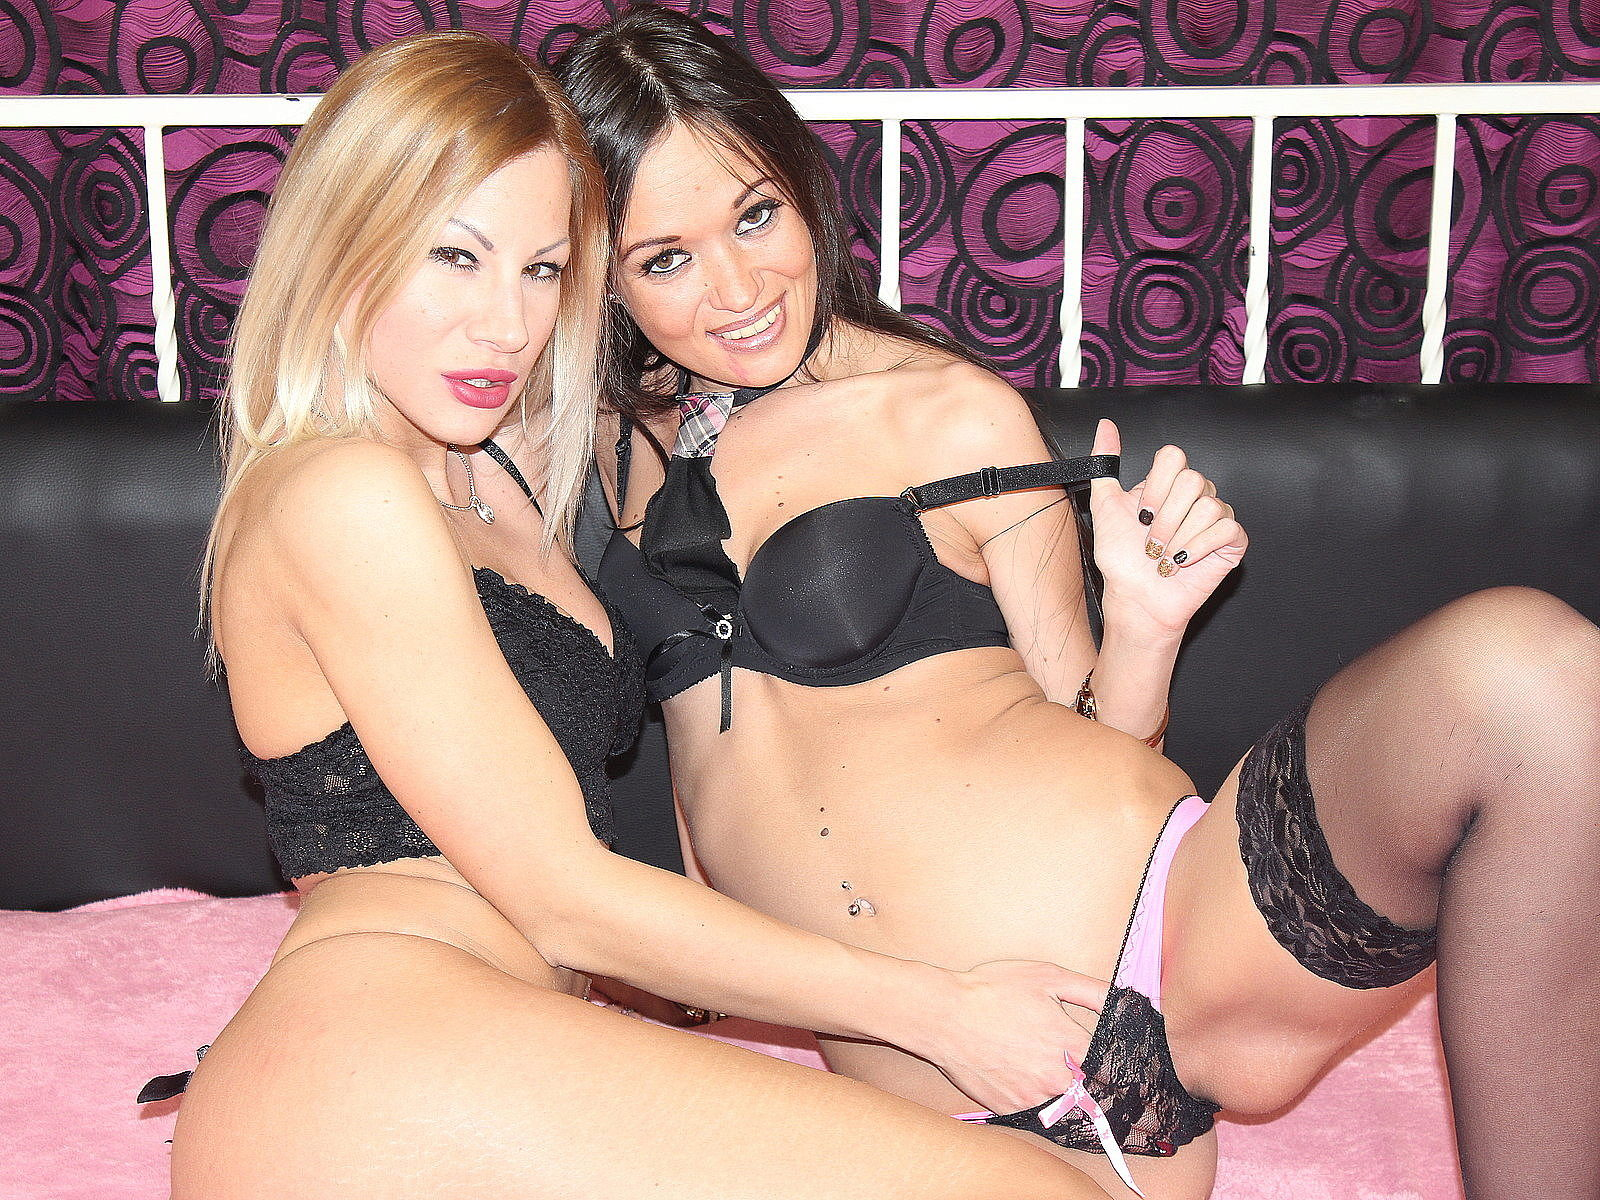 Barbi Black & Ziva Fuego